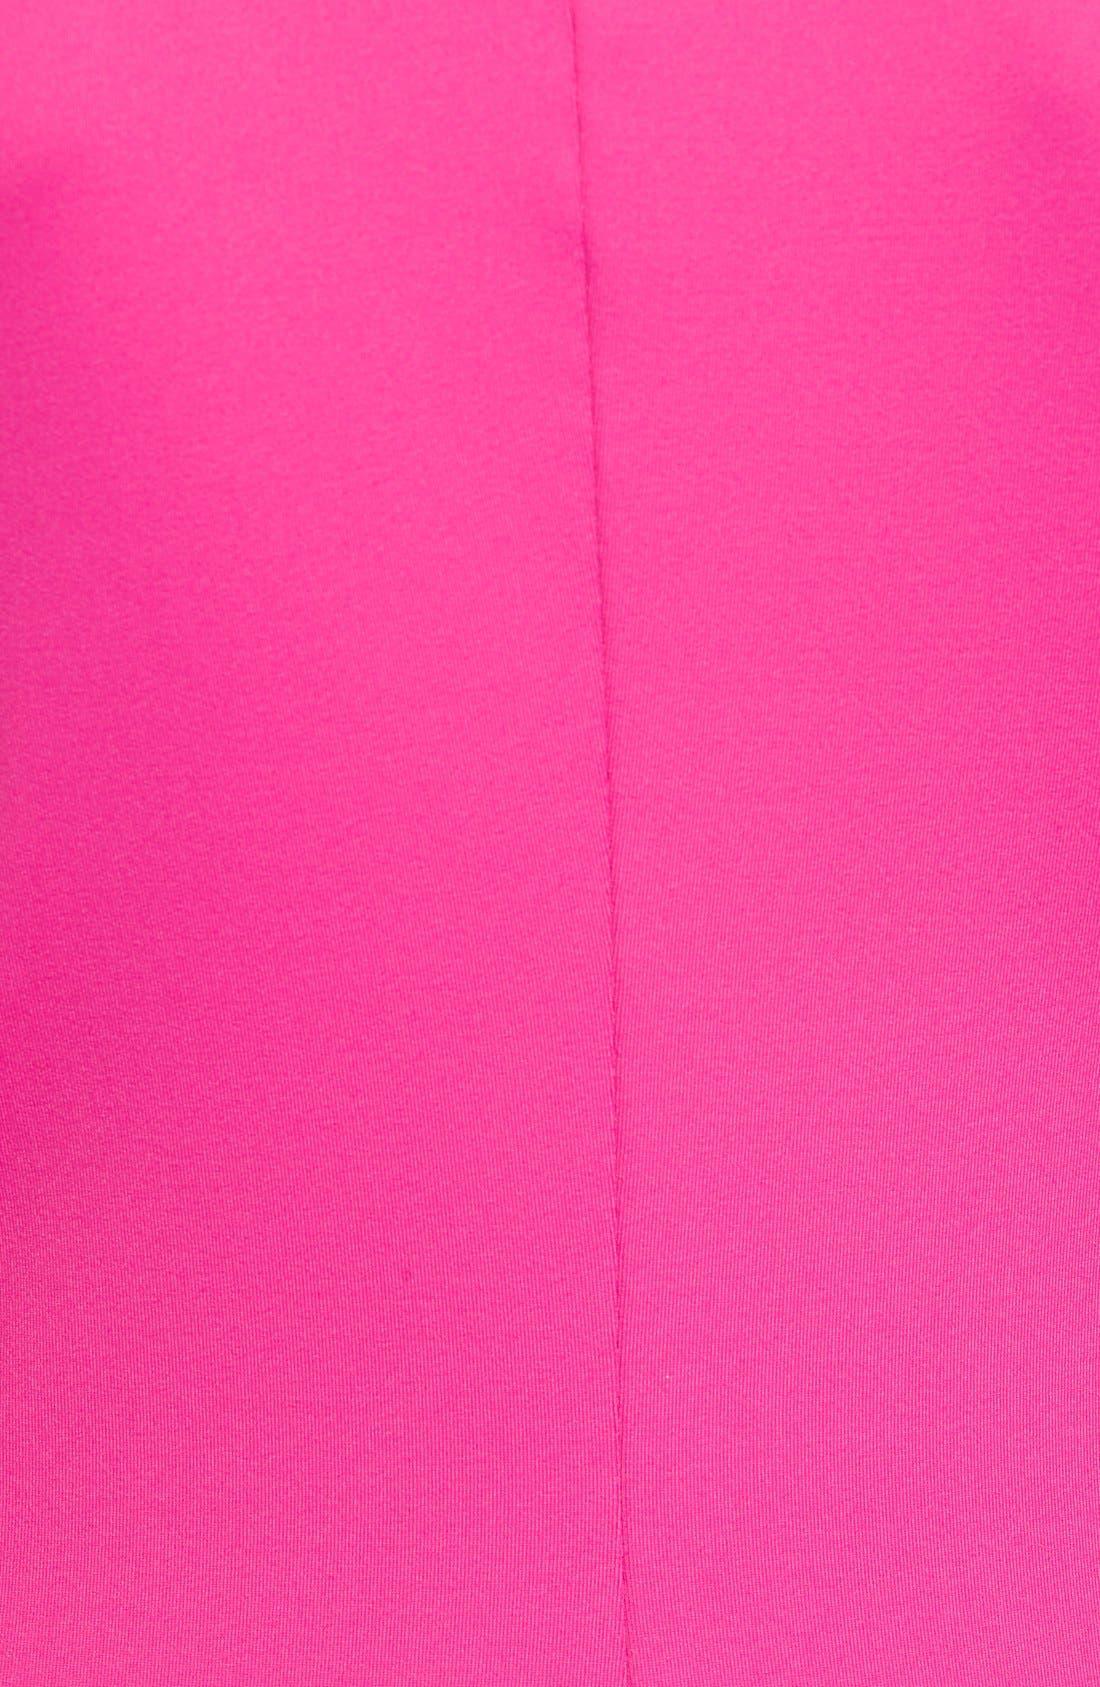 ,                             V-Neck Body-Con Dress,                             Alternate thumbnail 40, color,                             651